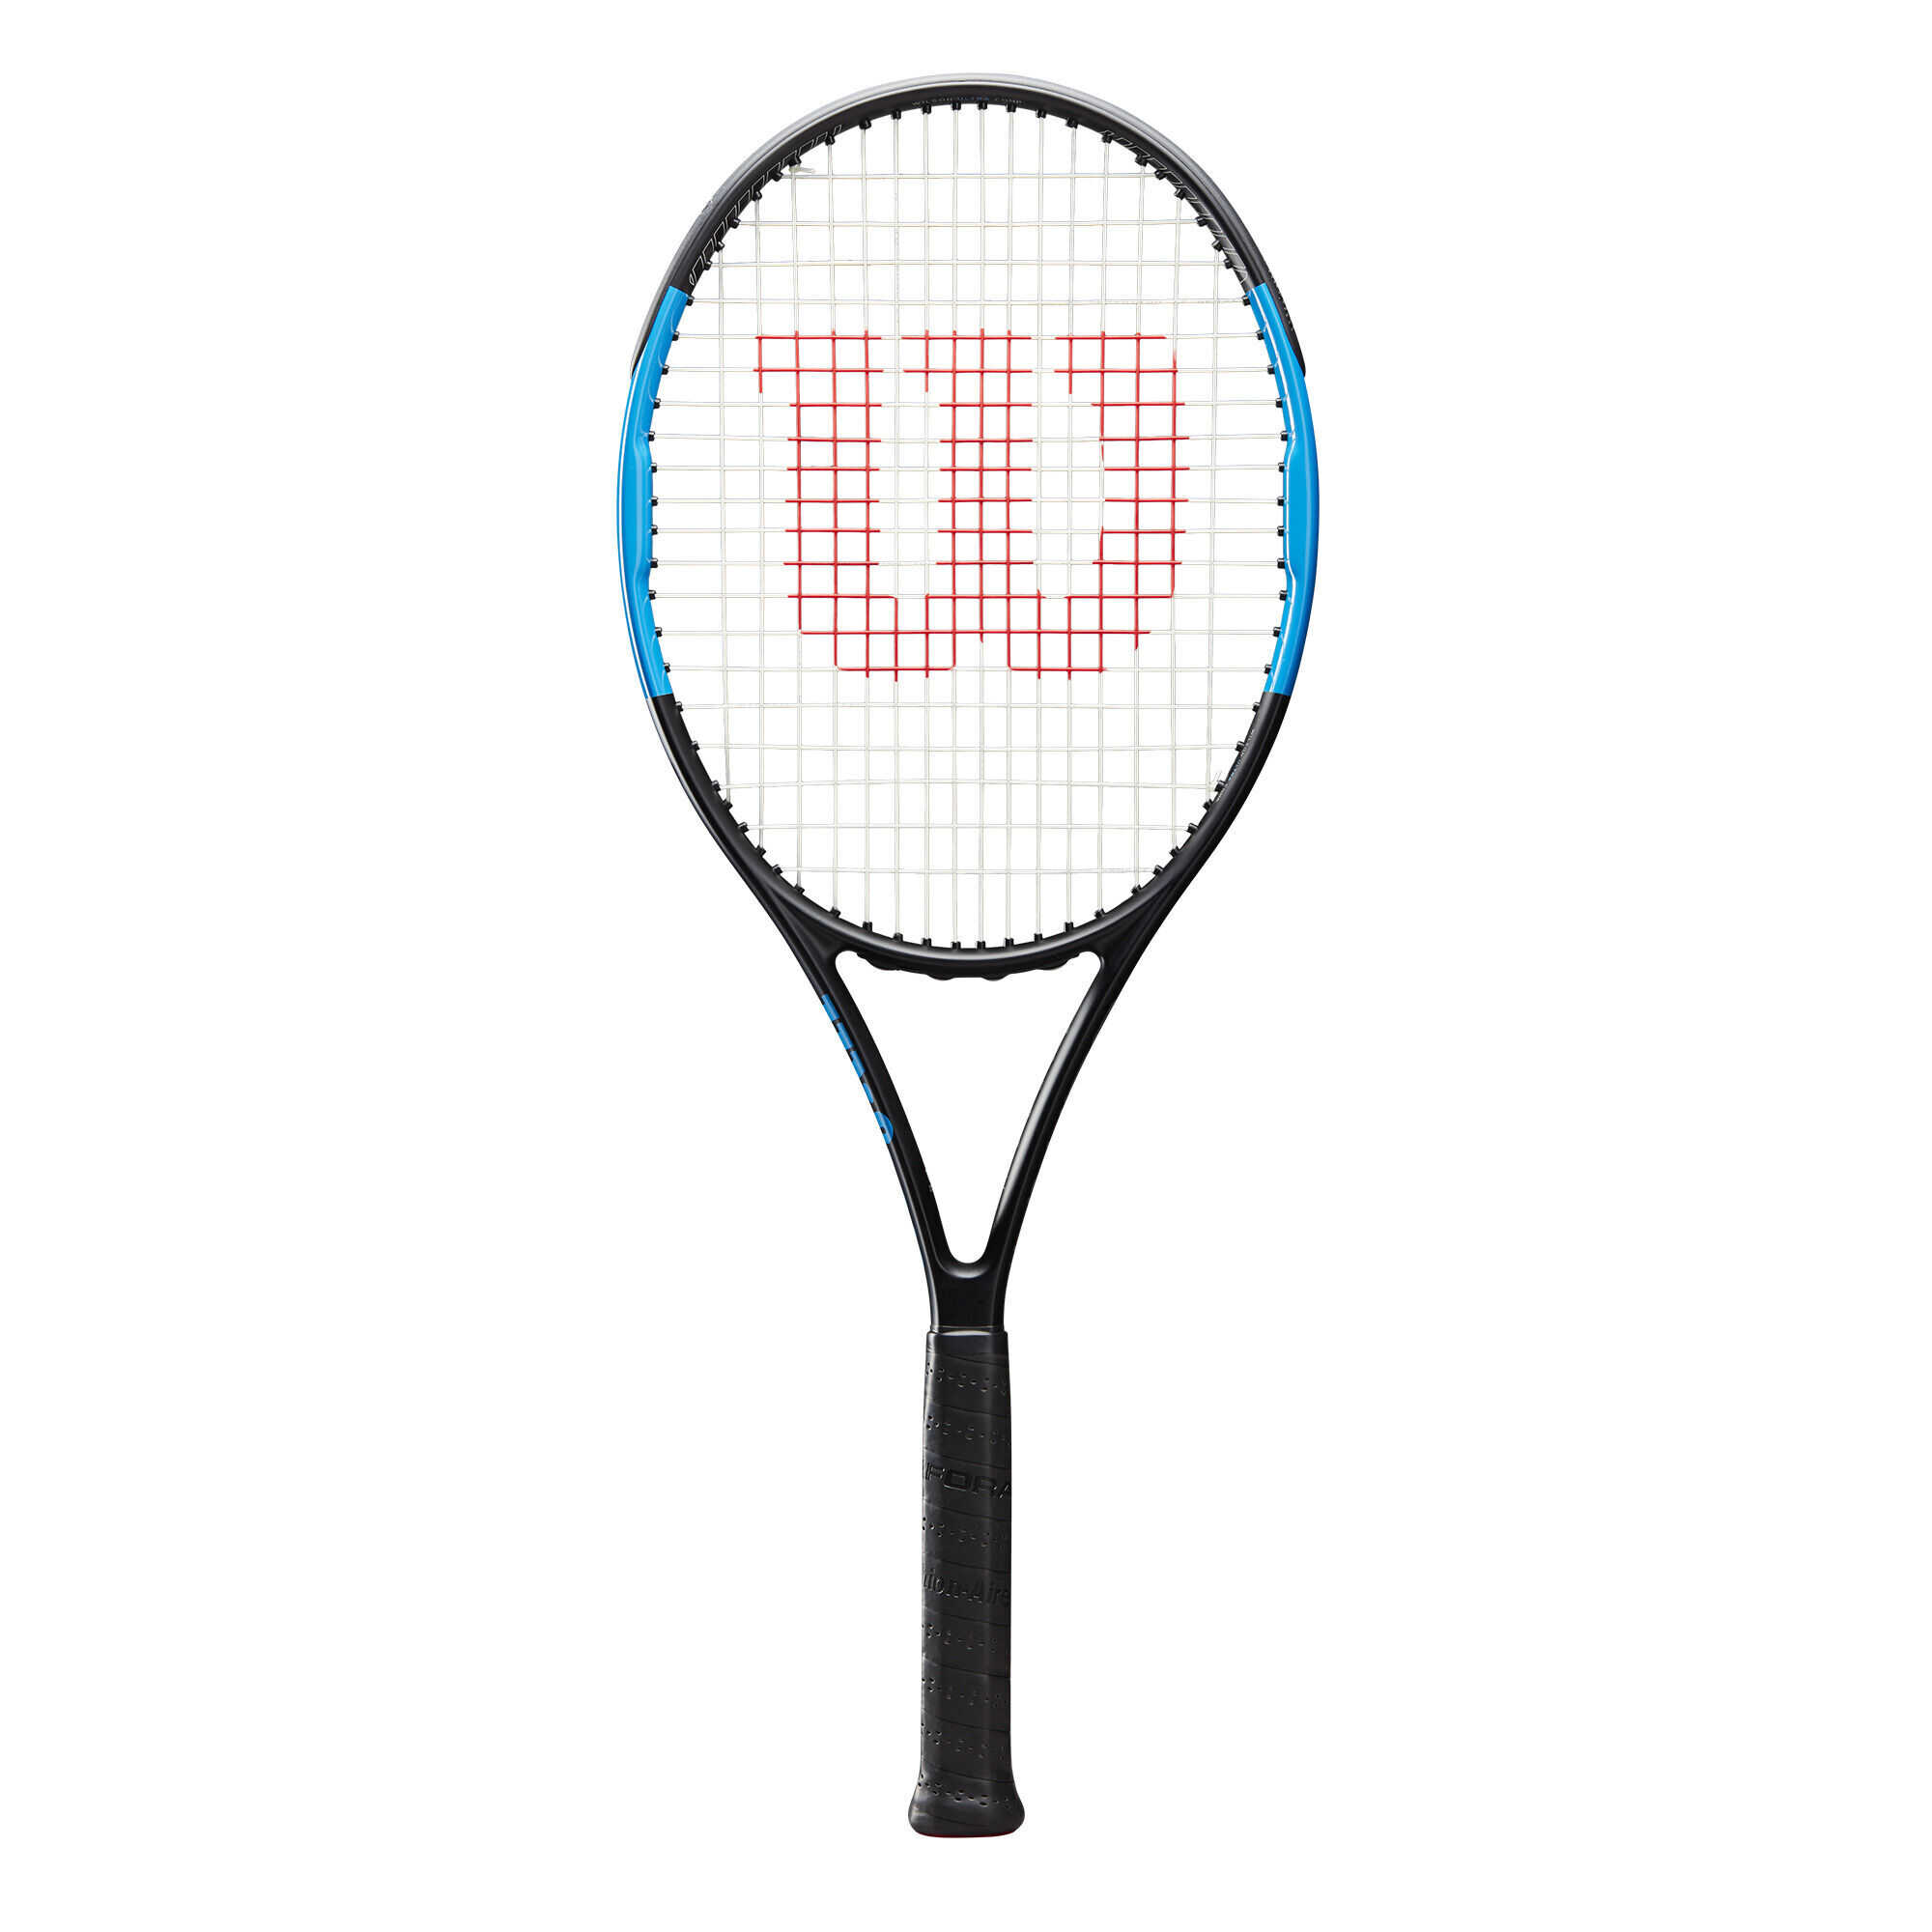 Yonex S-FIT 3 Tennis Raqcuet Grip 4 1//2